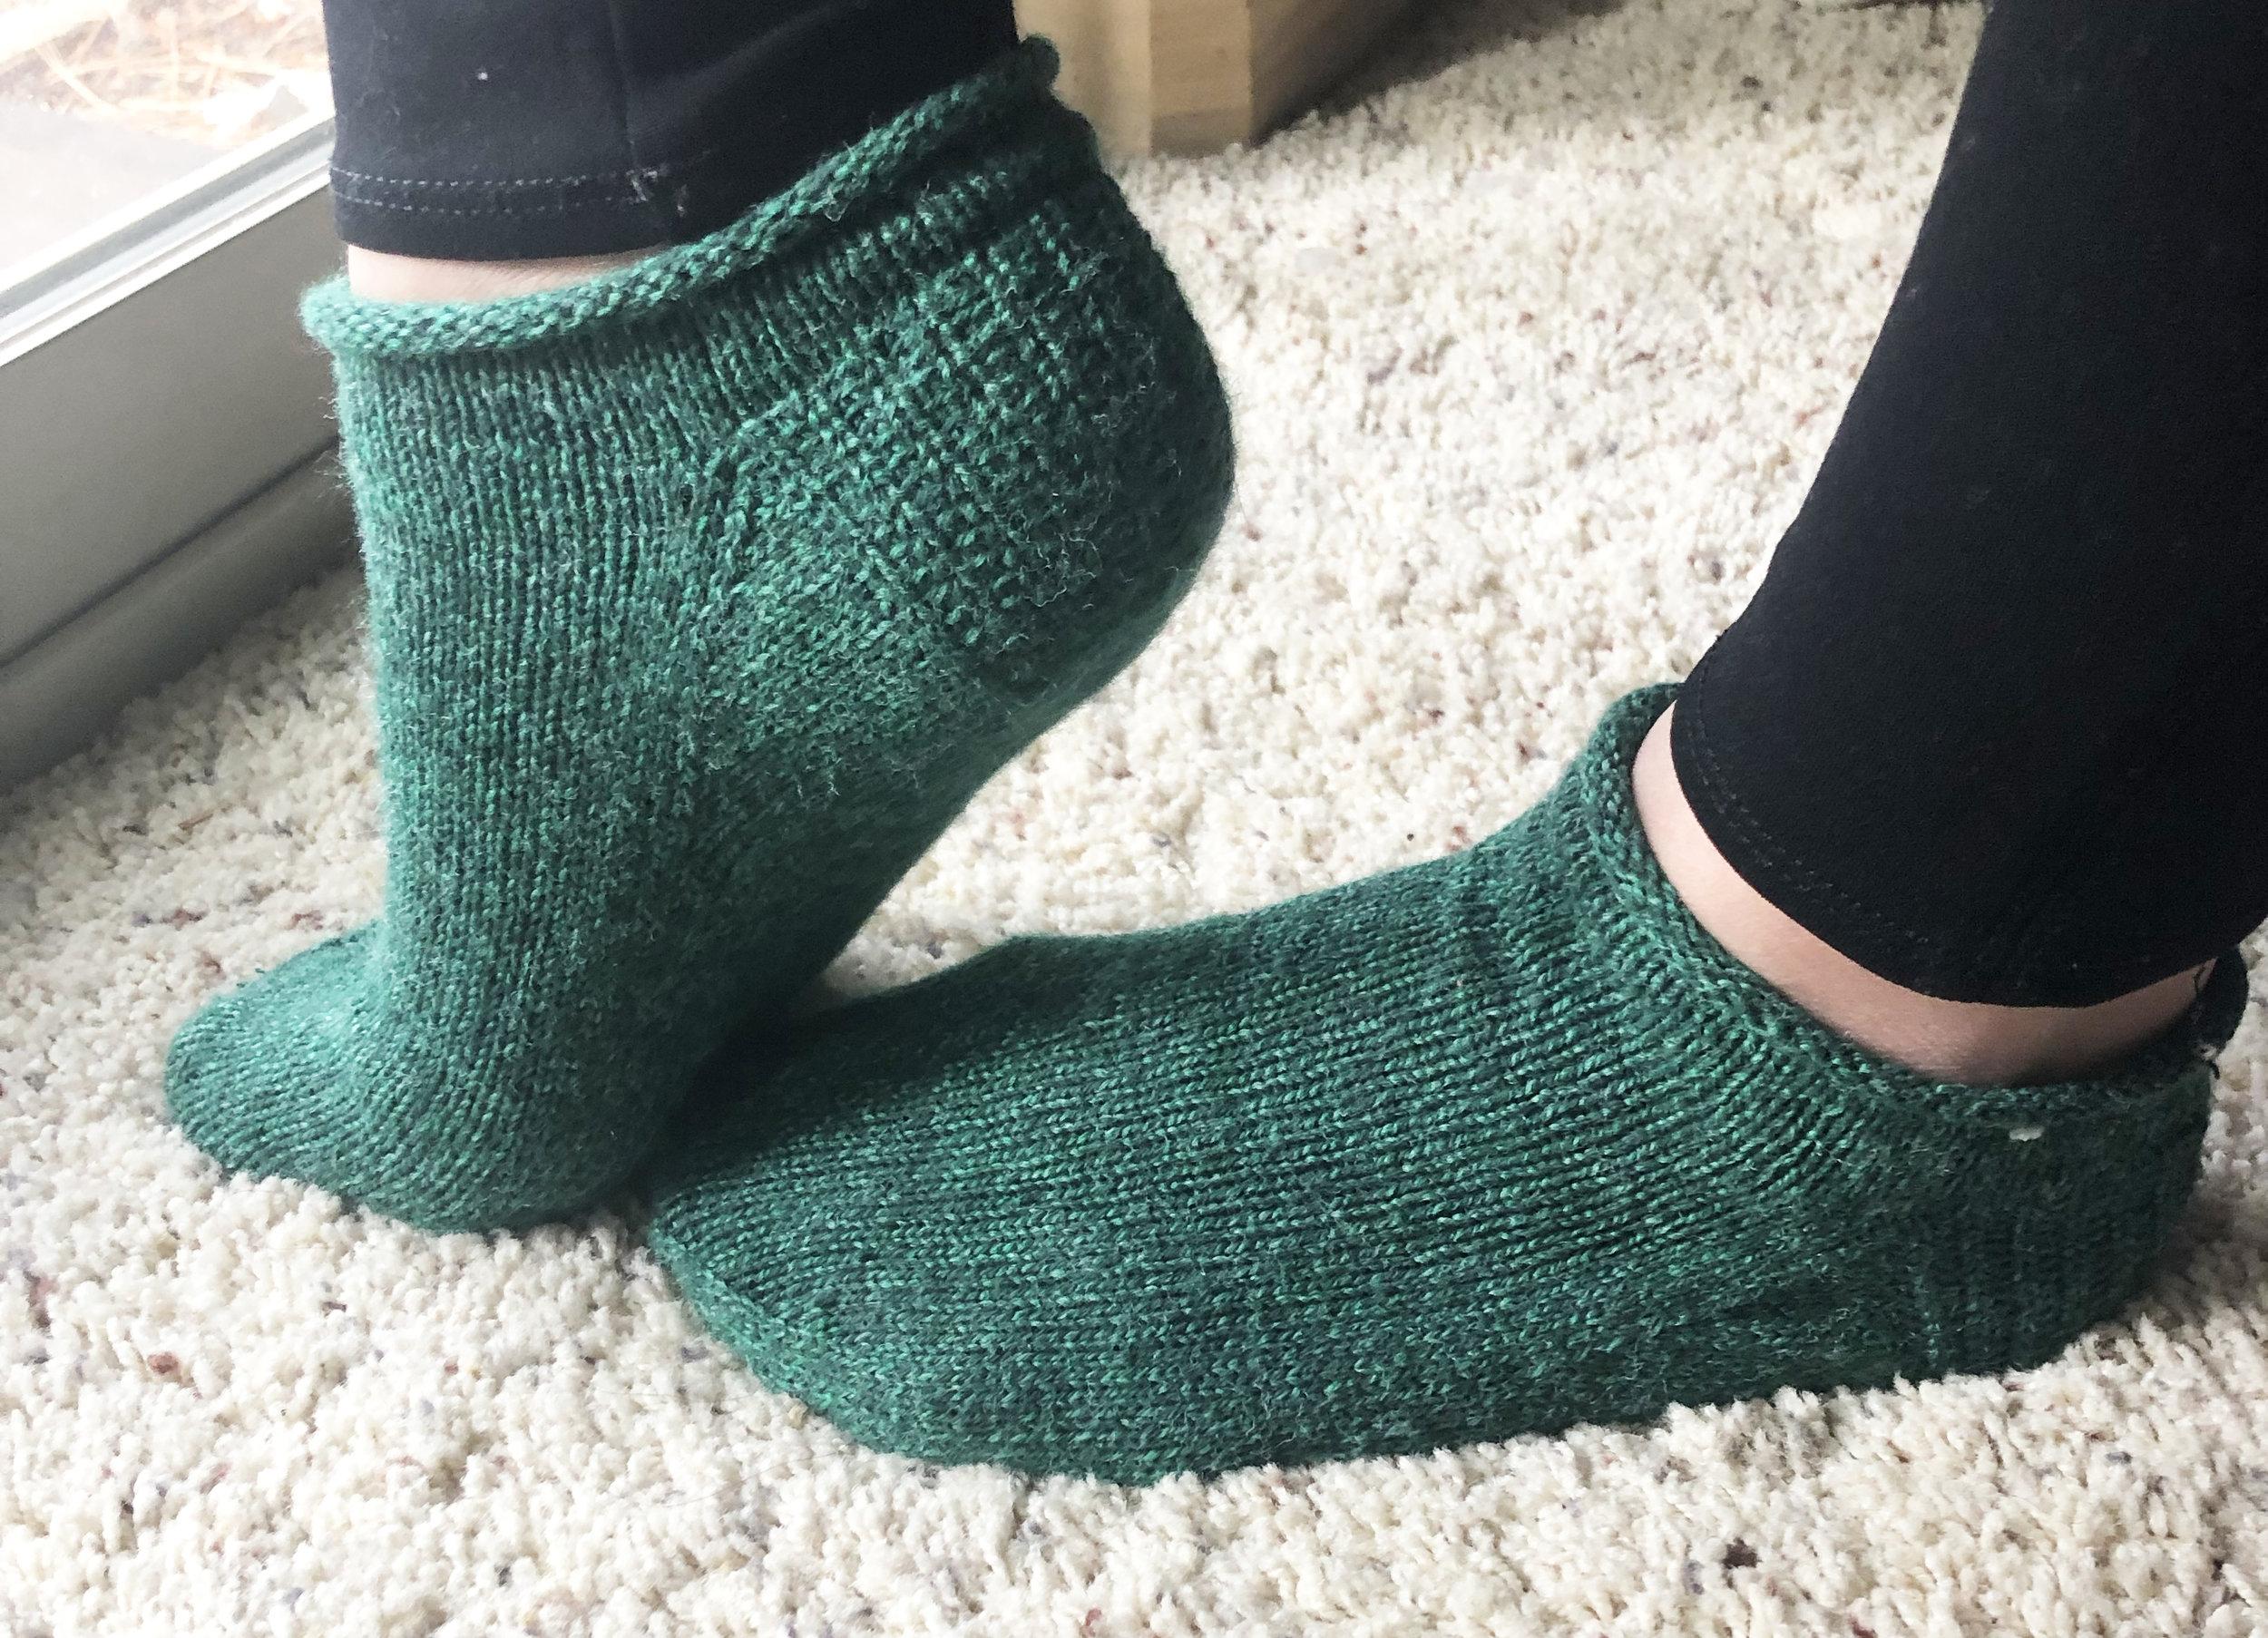 knit-ankle-roll-socks-elisemade.jpg